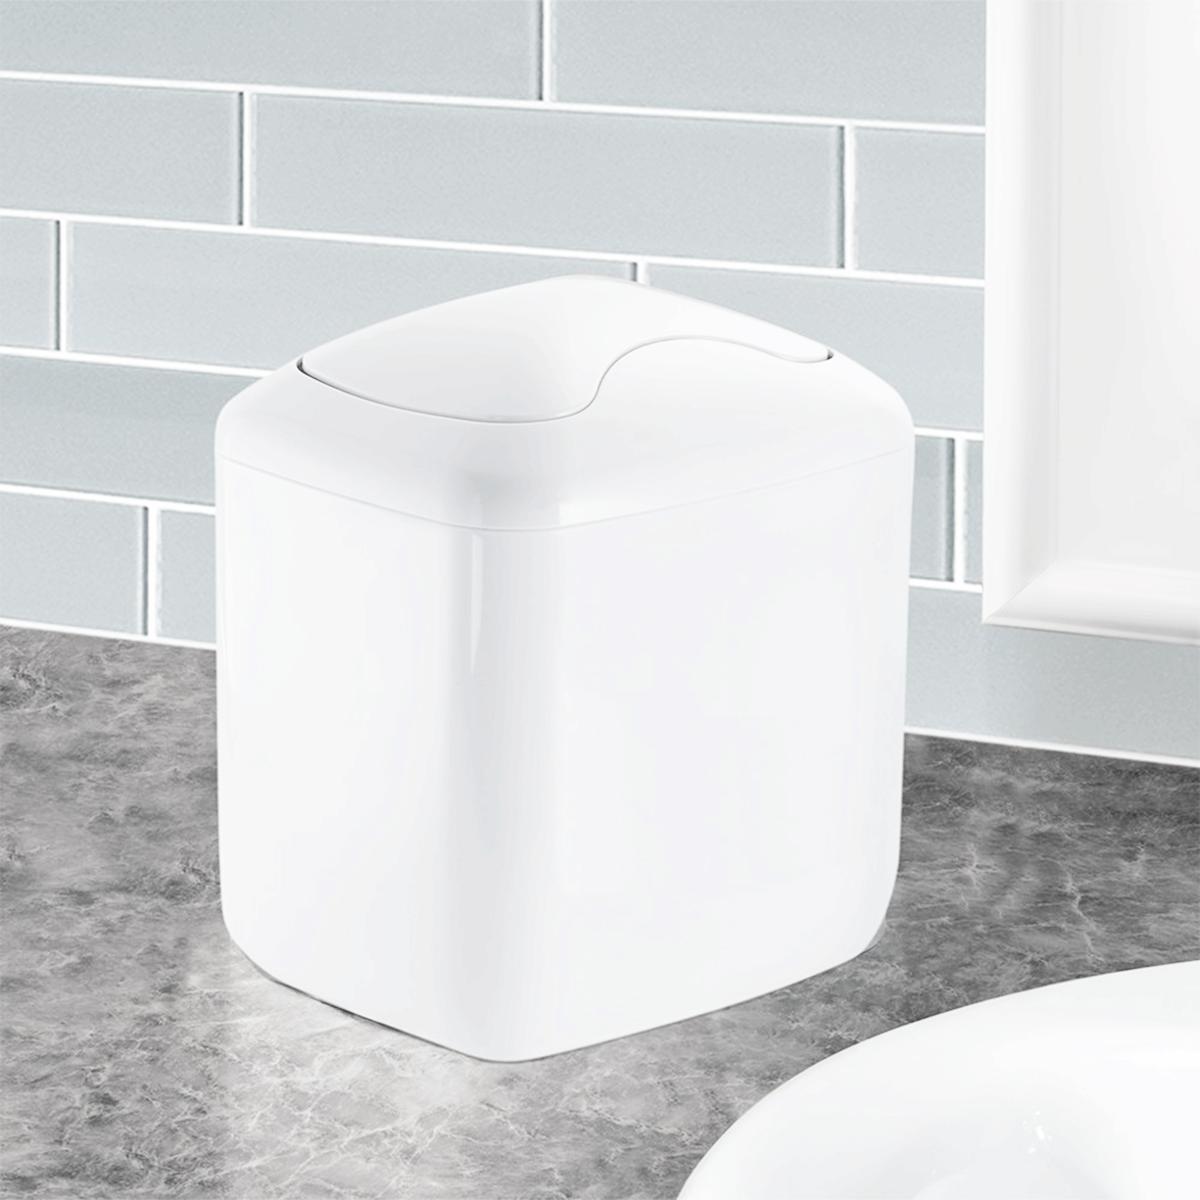 poubelle salle de bain osier best affordable with poubelle salle de bain osier finest meuble. Black Bedroom Furniture Sets. Home Design Ideas